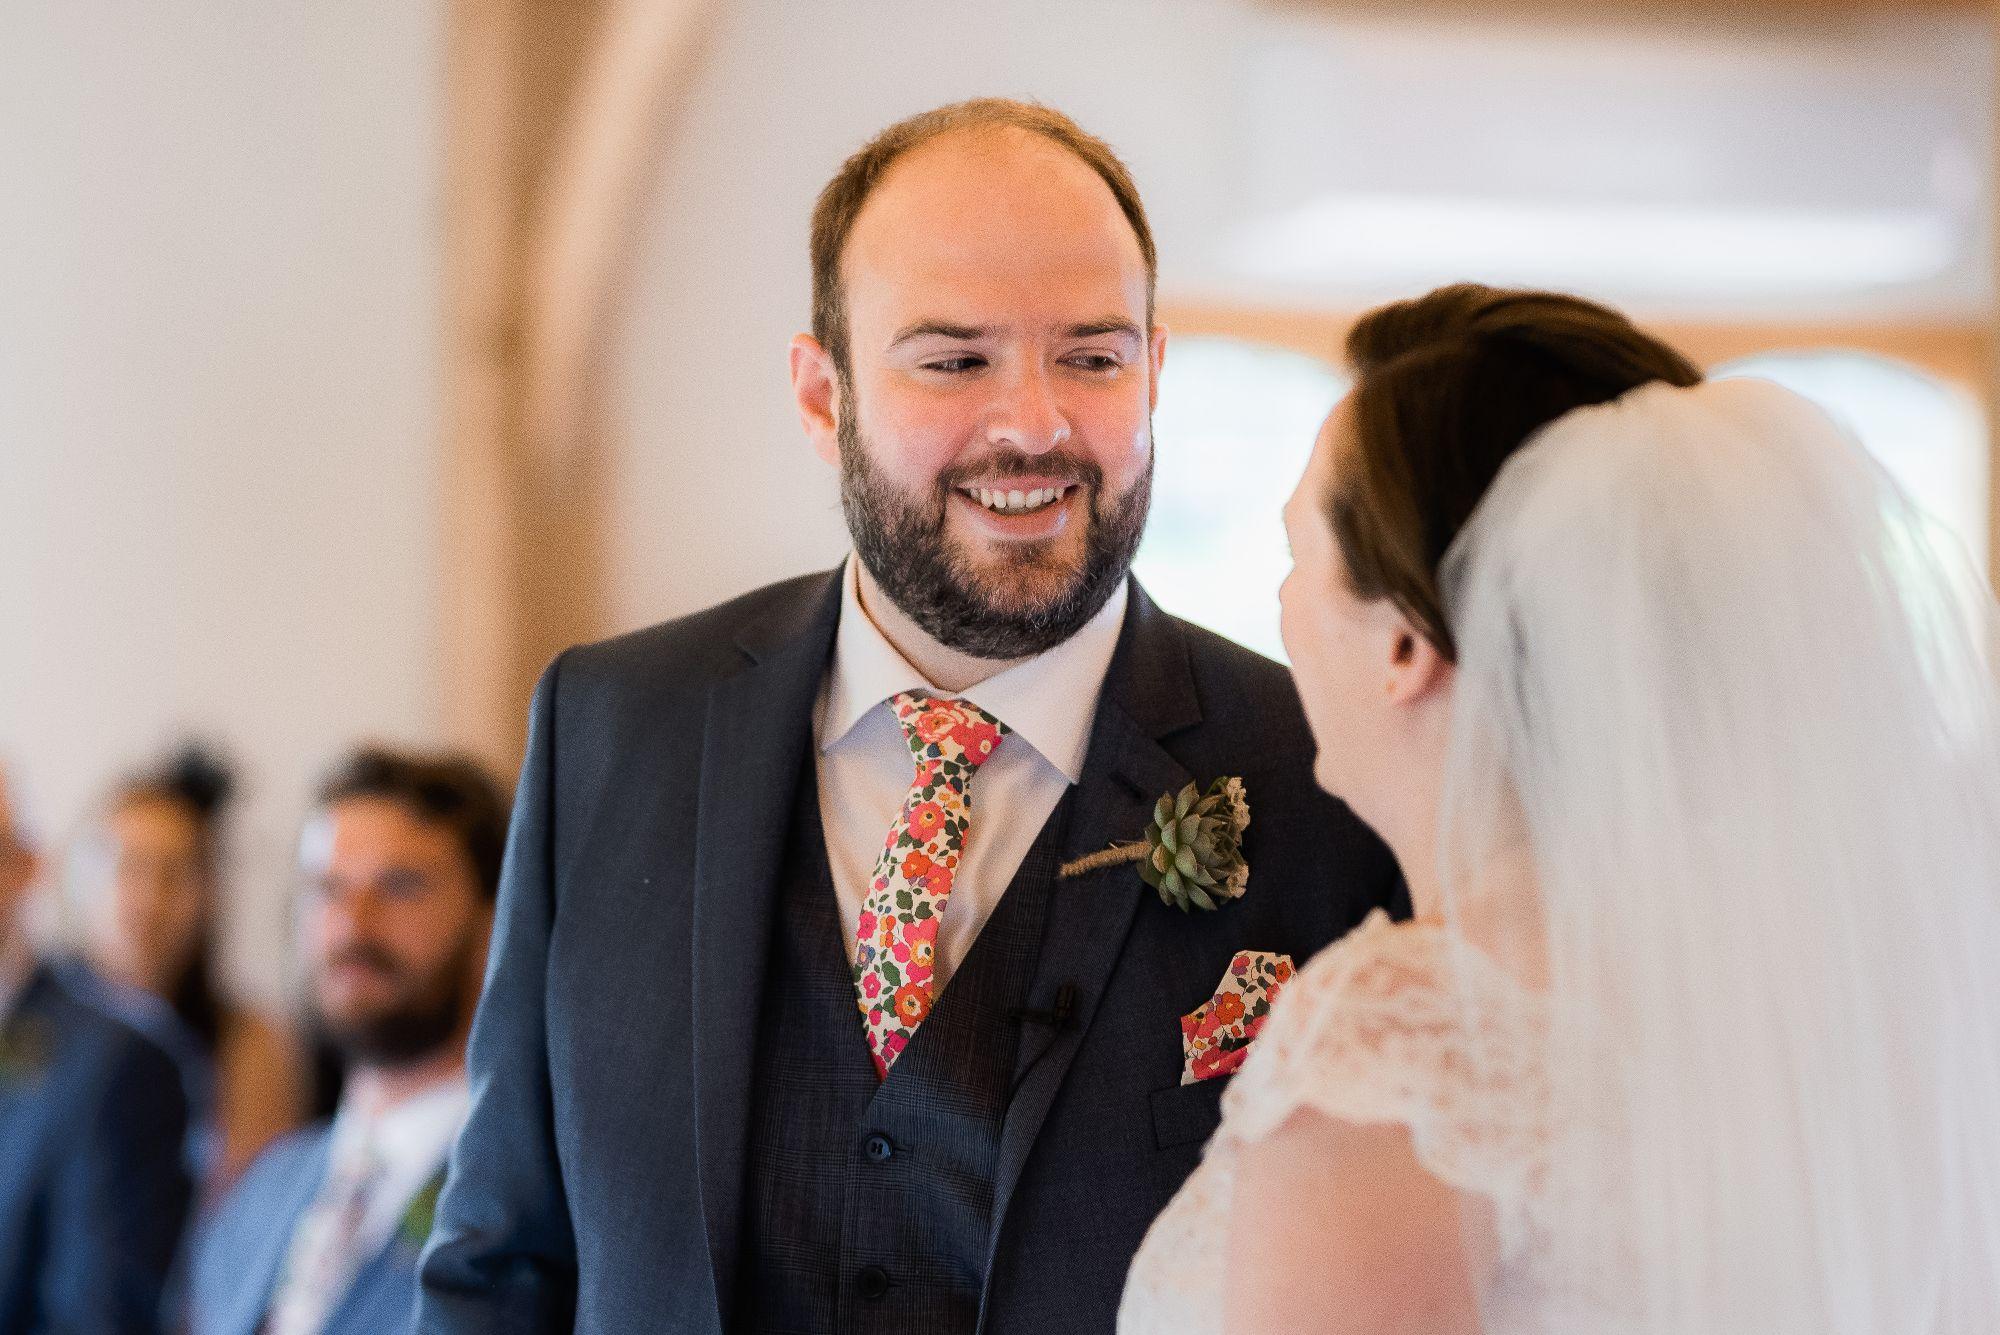 Custom made wedding tie